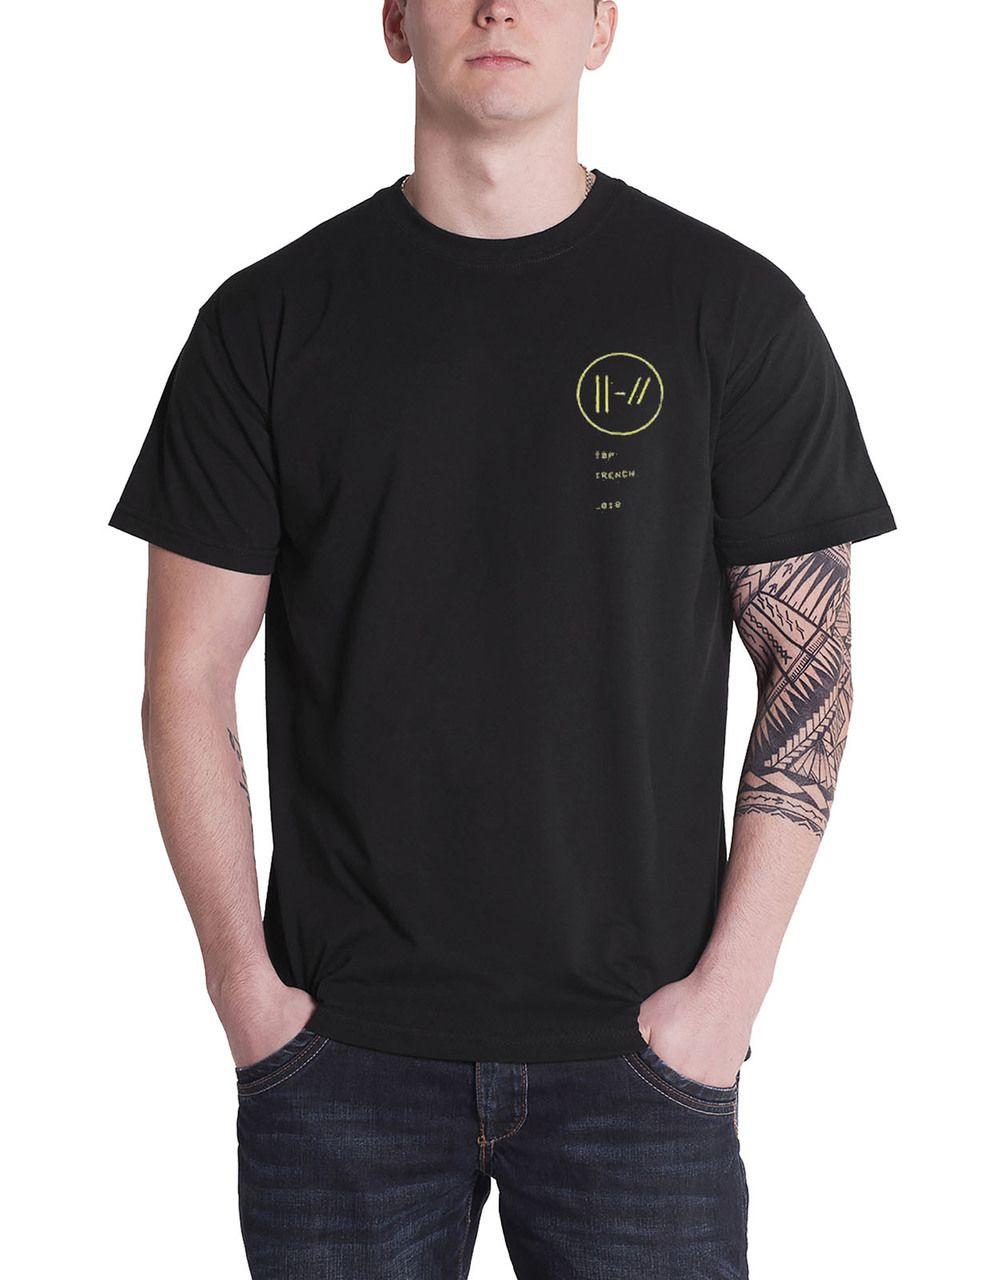 364169e2b Twenty One Pilots T Shirt Trench Bandito Circle Band Logo Mens Black - Paradiso  Clothing